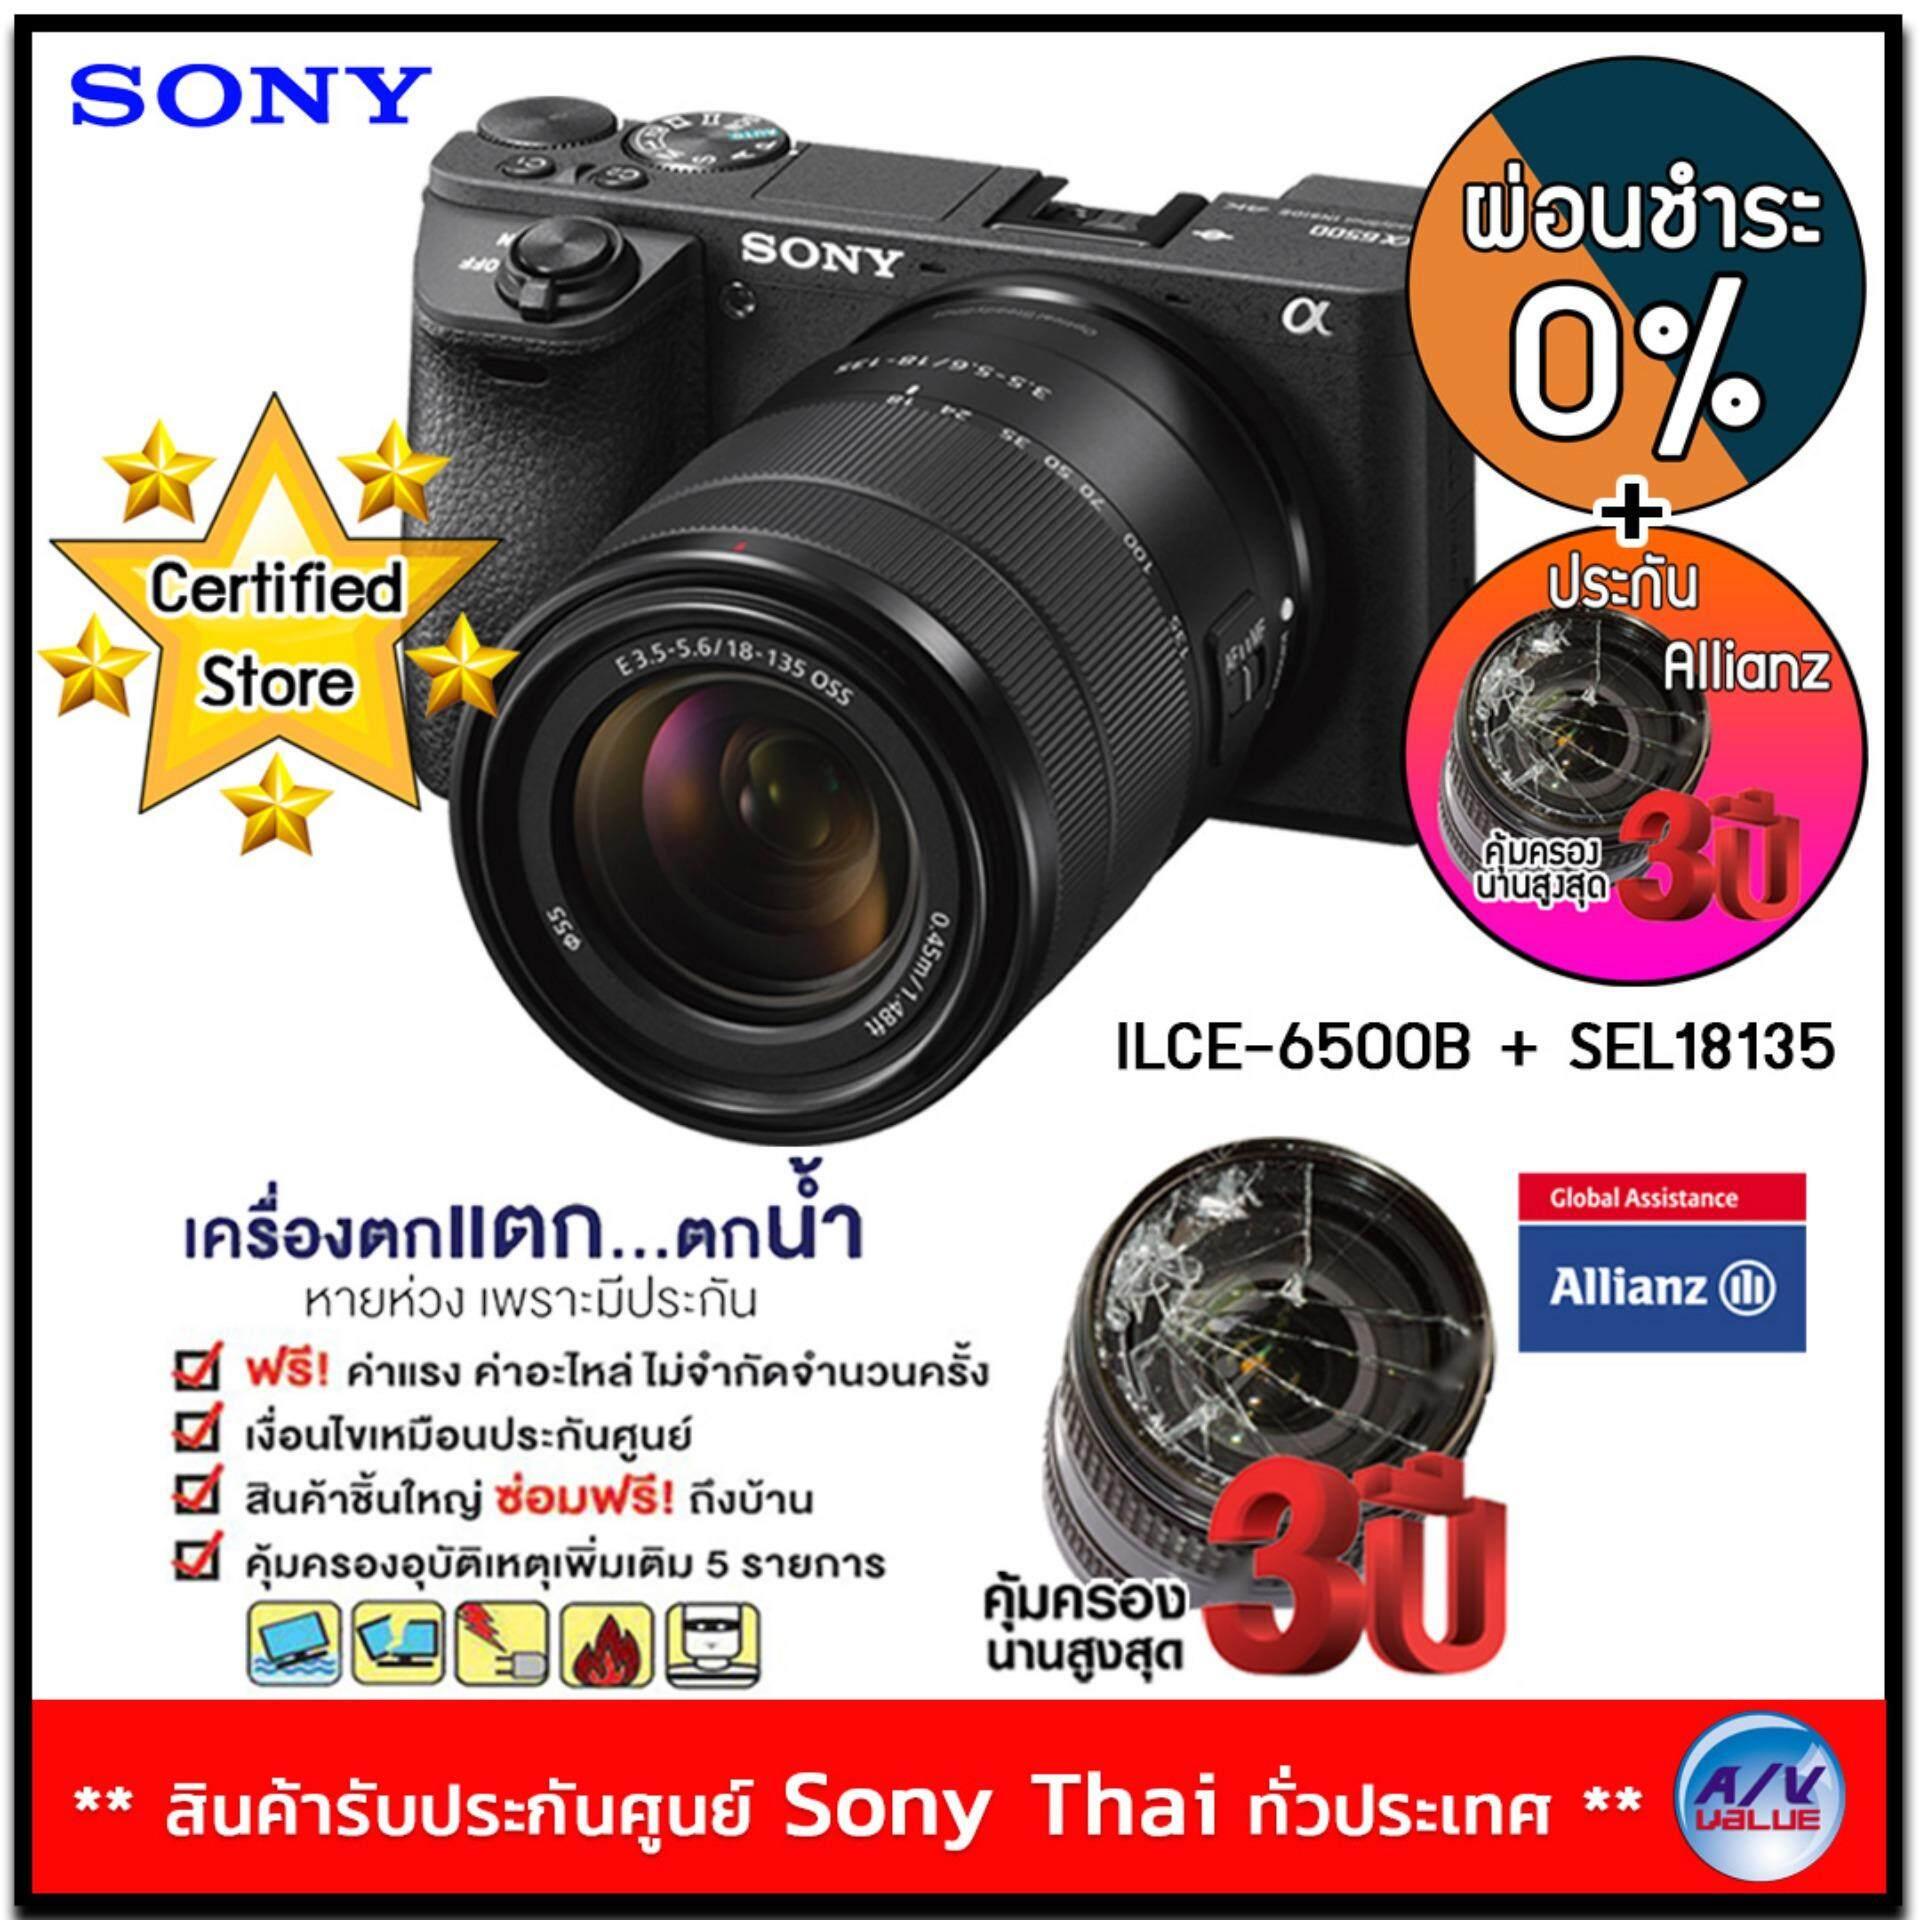 Sony Alpha รุุ่น Ilce-6500m Mirrorless Digital Camera + Sel18-135mm Lens + ประกันพิเศษจาก Allianz คุ้มครอง 3 ปี **ผ่อนชำระ 0%.